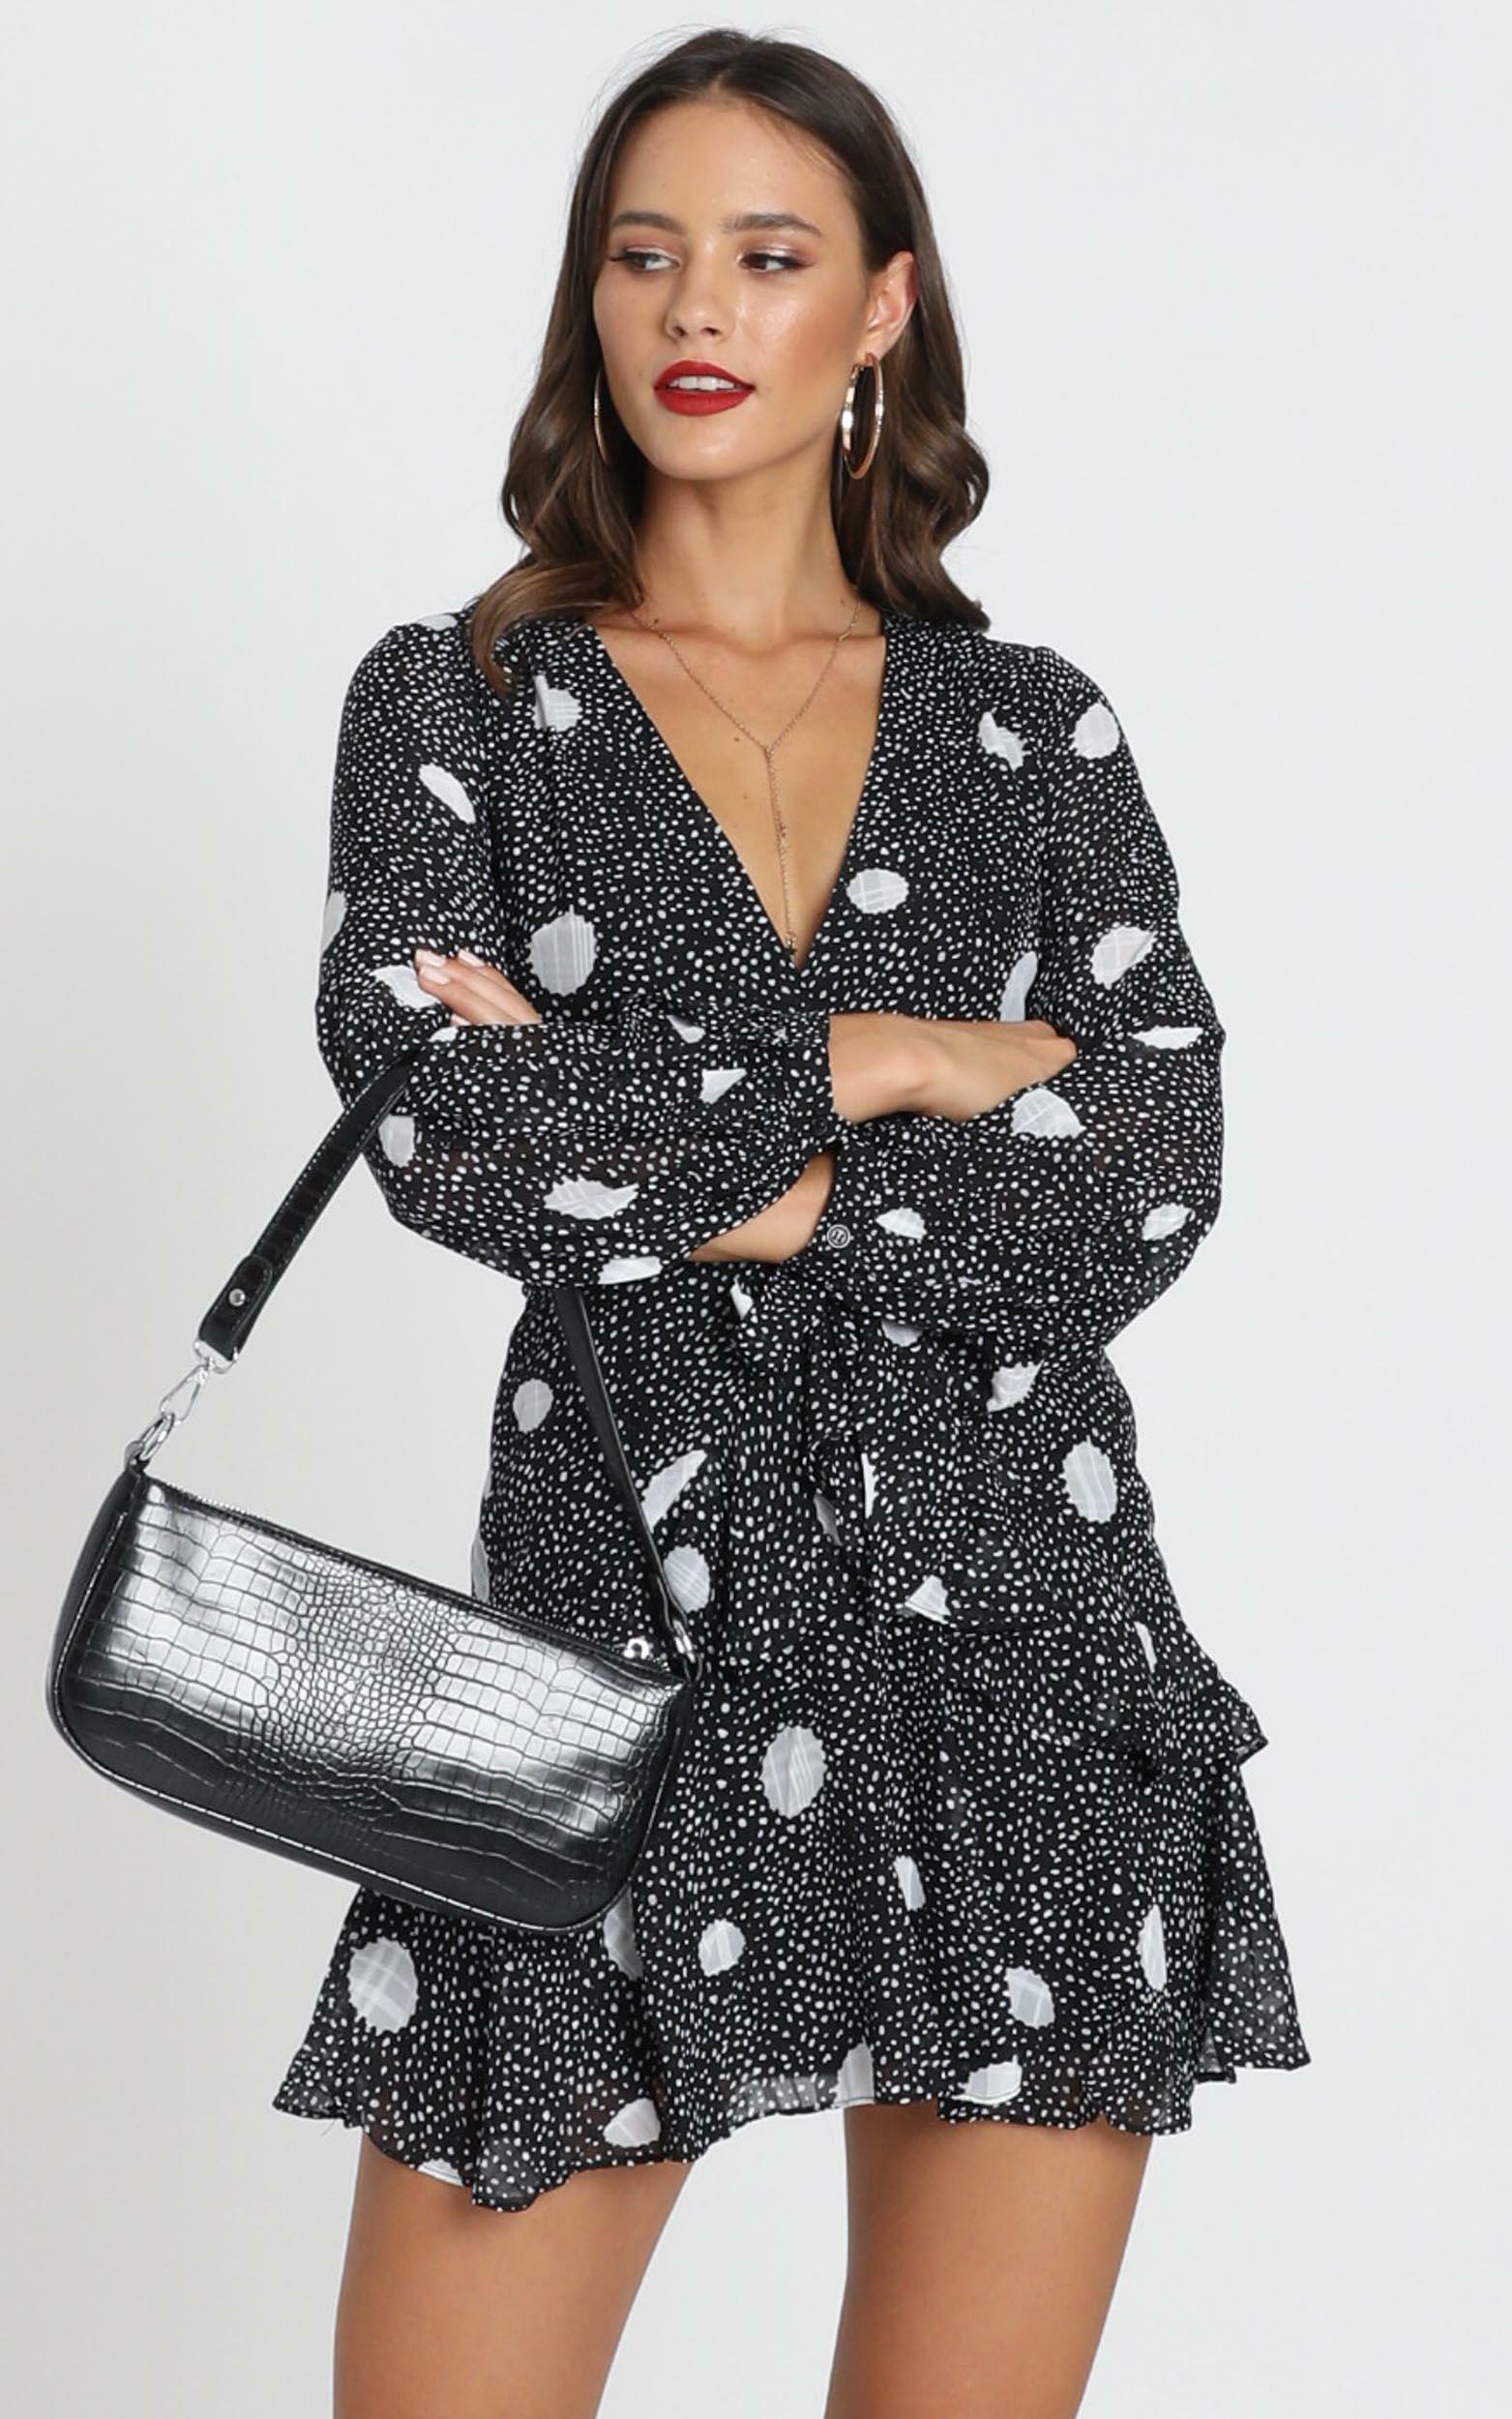 Aurelia V-Neck Mini Dress in black polka - 12 (L), Black, hi-res image number null